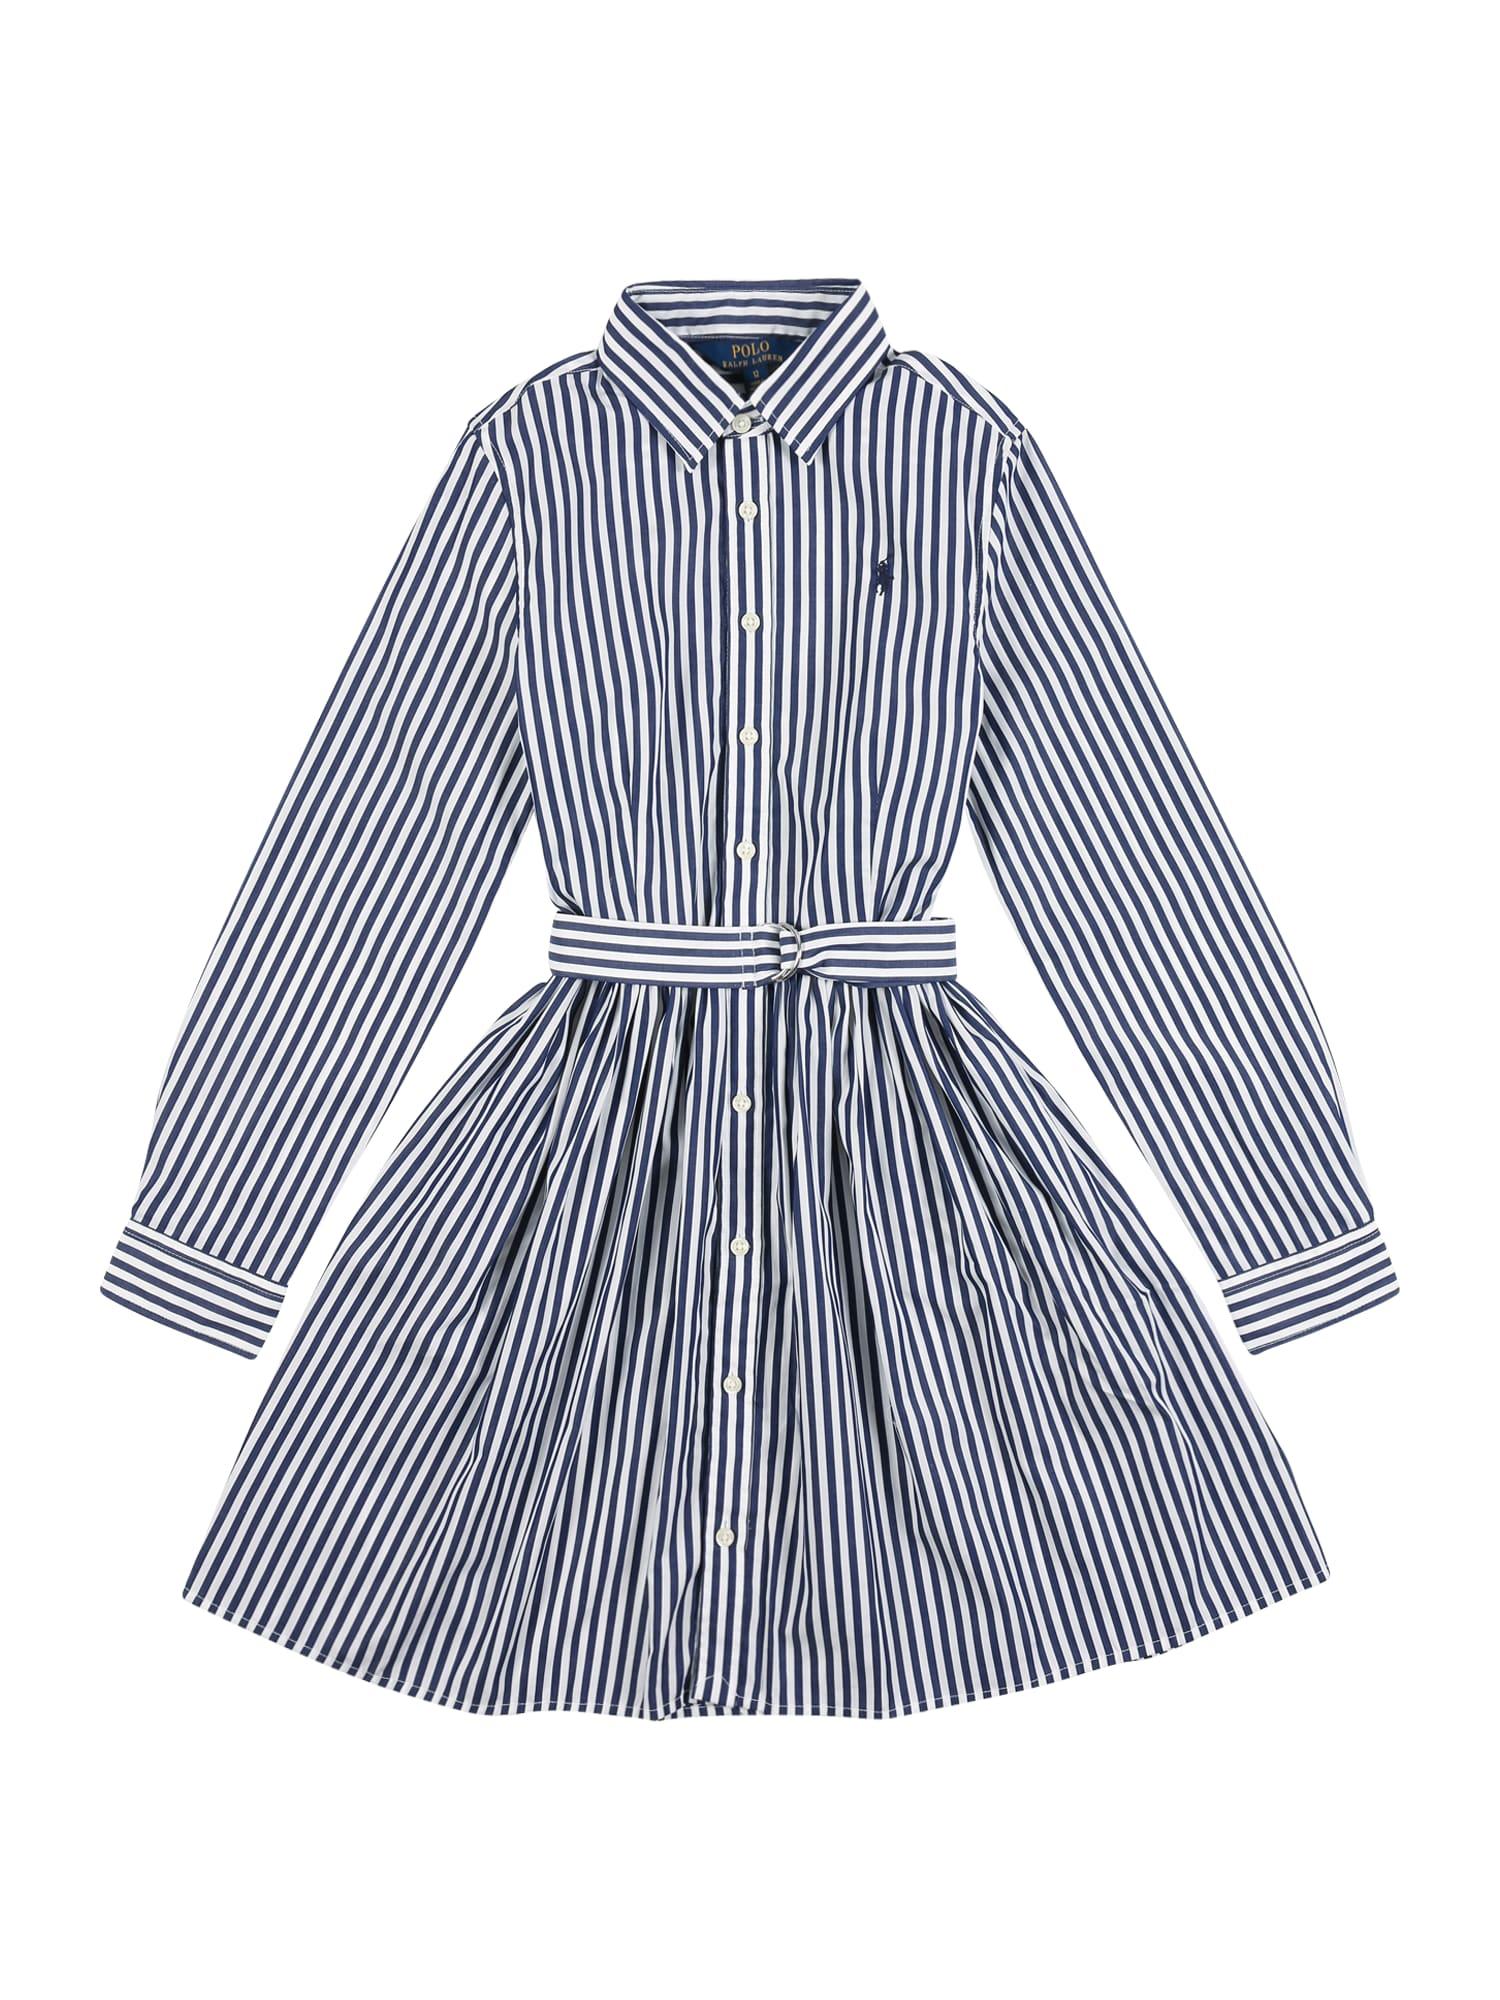 POLO RALPH LAUREN Šaty 'Bengal'  námornícka modrá / biela